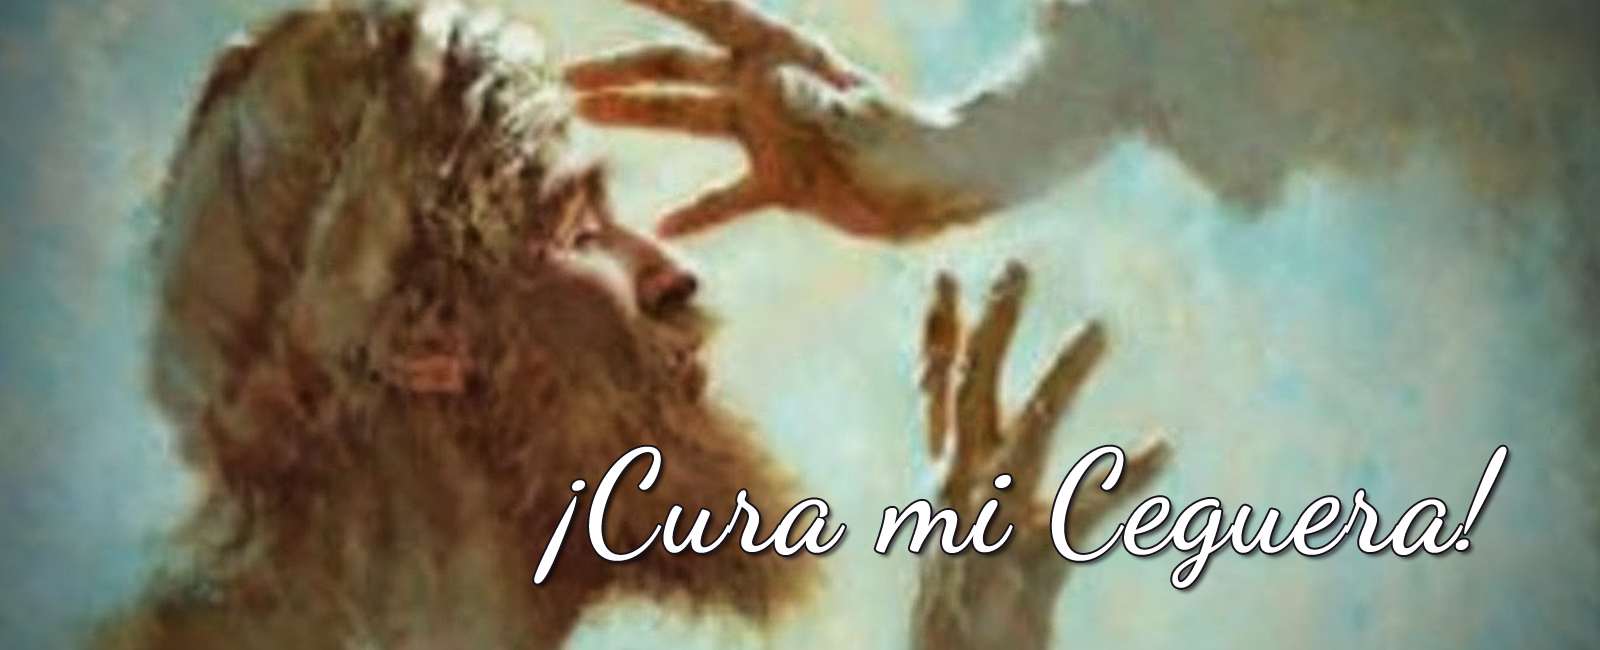 Parroquia El Altet - Evangelio 28 de Octubre